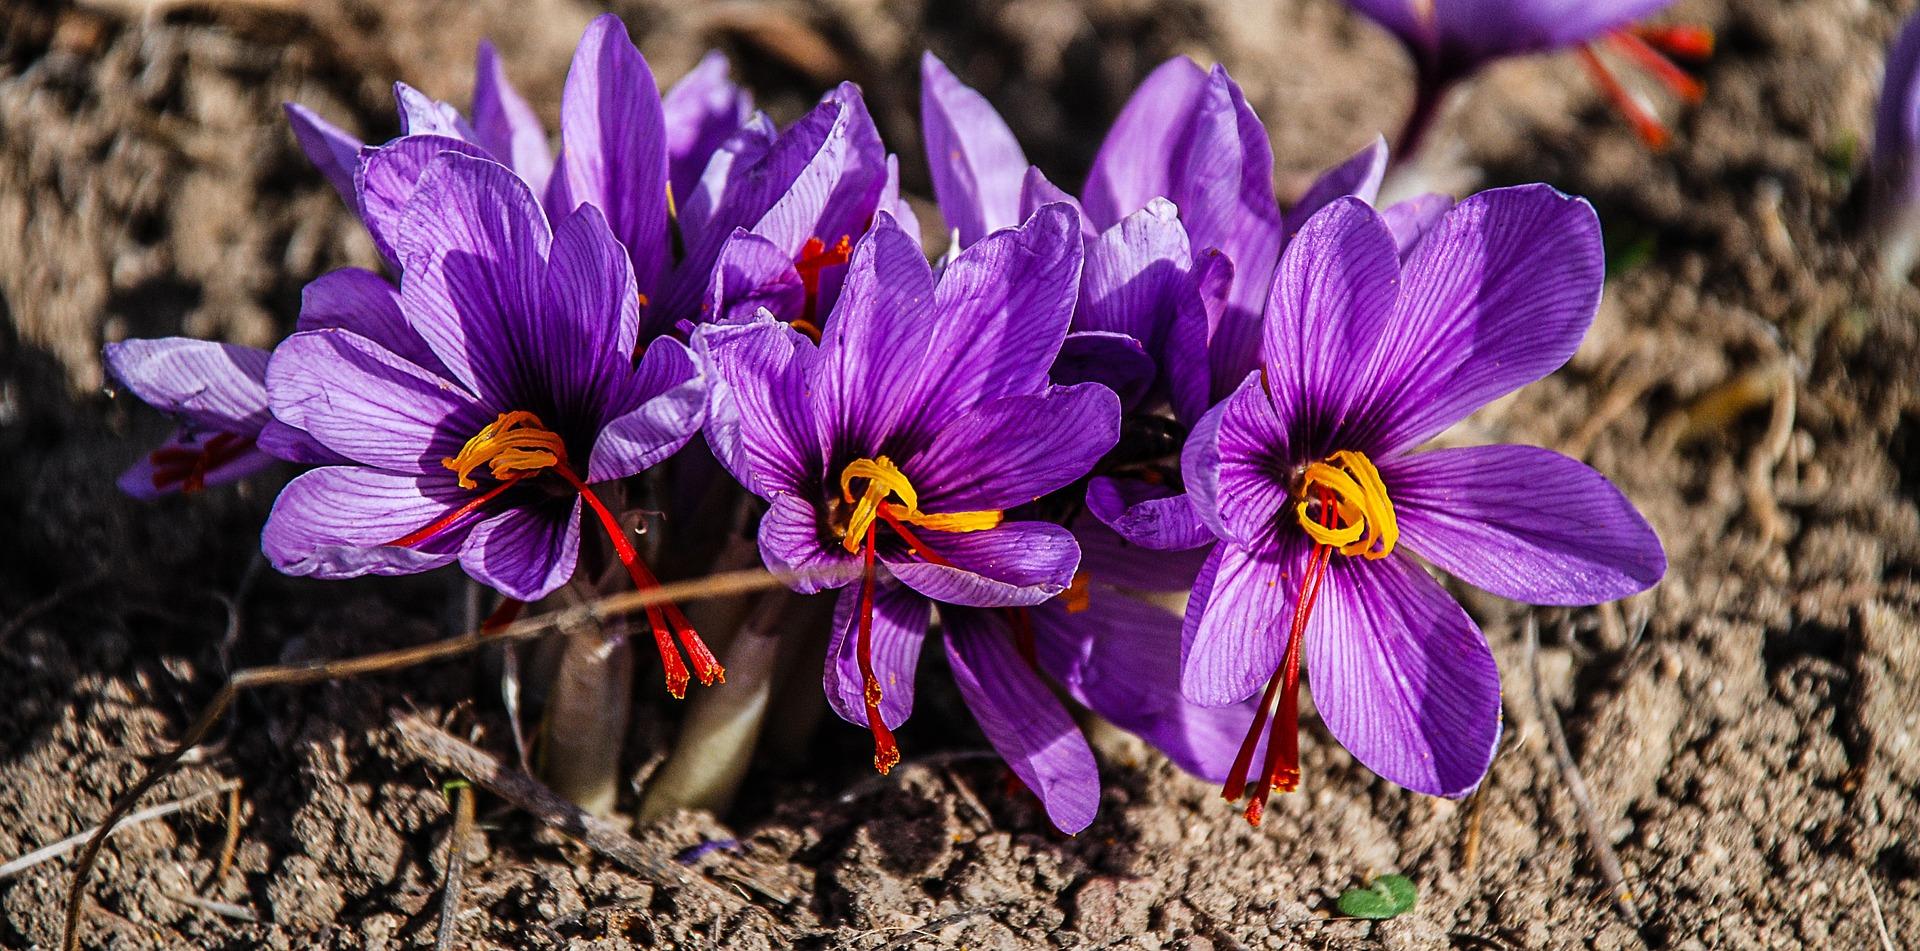 Saffron crocuses grown near our luxury hotels, Umbria.